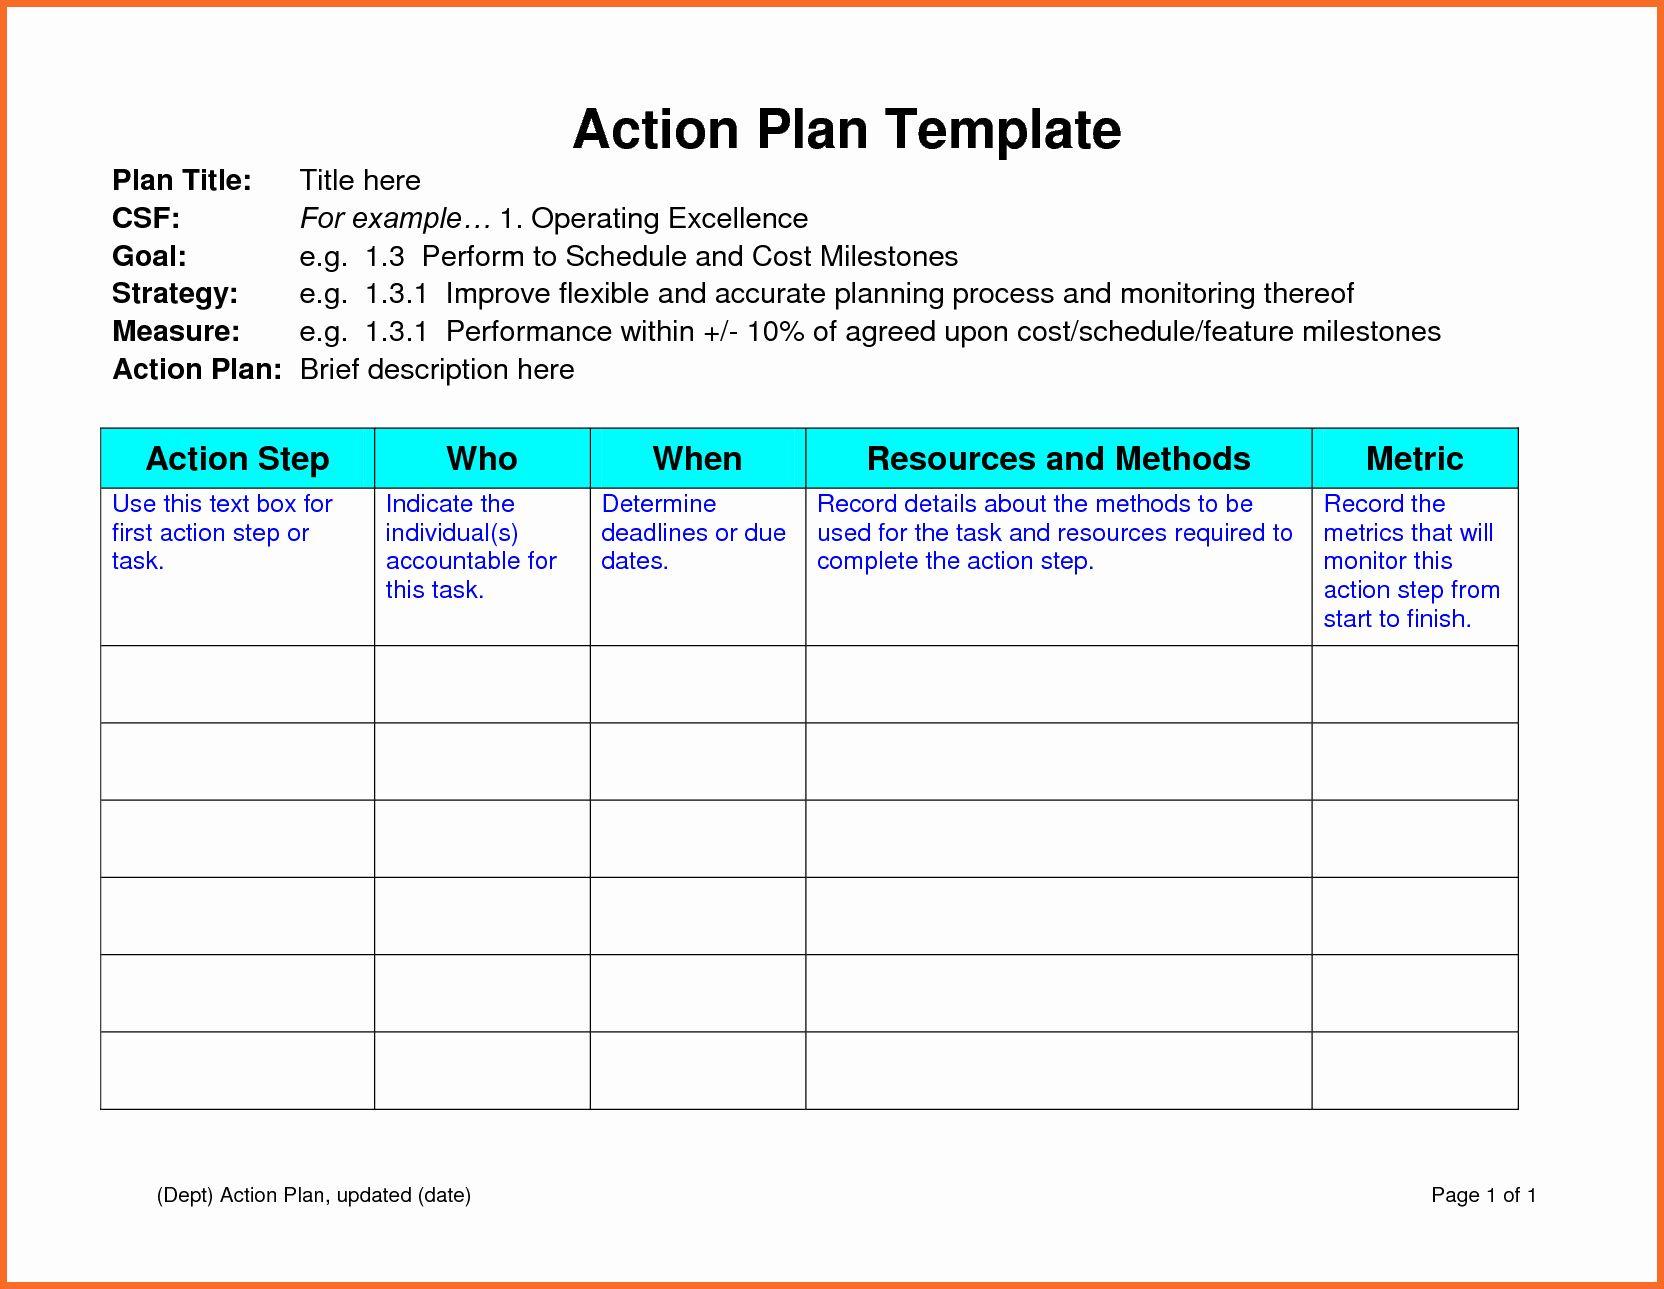 Sales Account Plan Template Unique Smart Action Plans Template Gecce Tackletarts Simple Business Plan Template Action Plan Template Business Plan Template